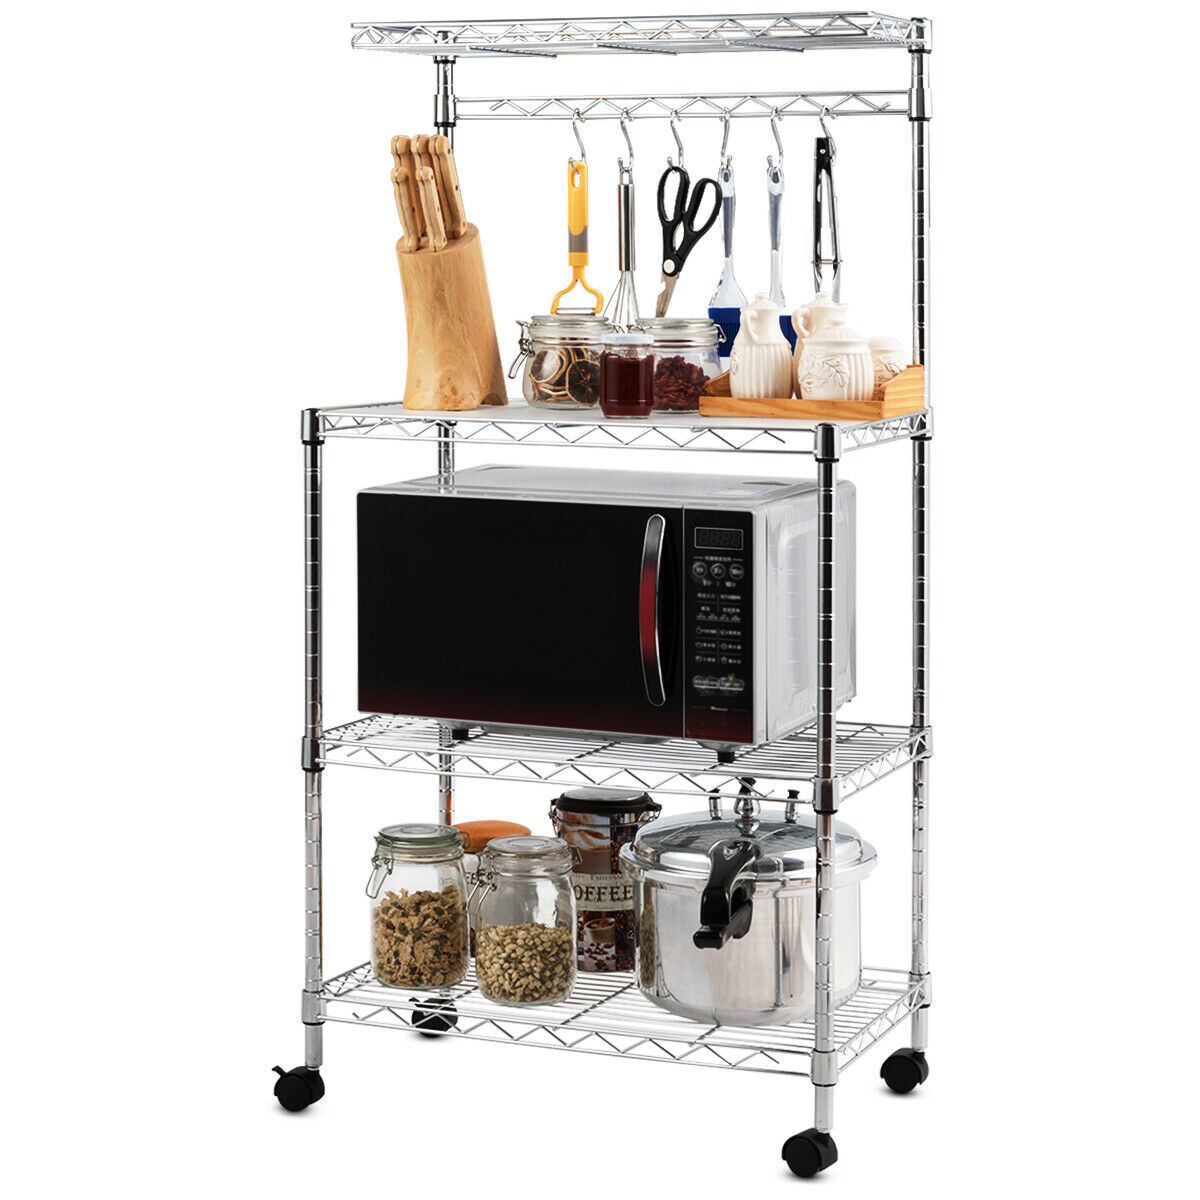 costway 3 tier kitchen baker s rack microwave oven stand storage cart workstation shelf metal sliver